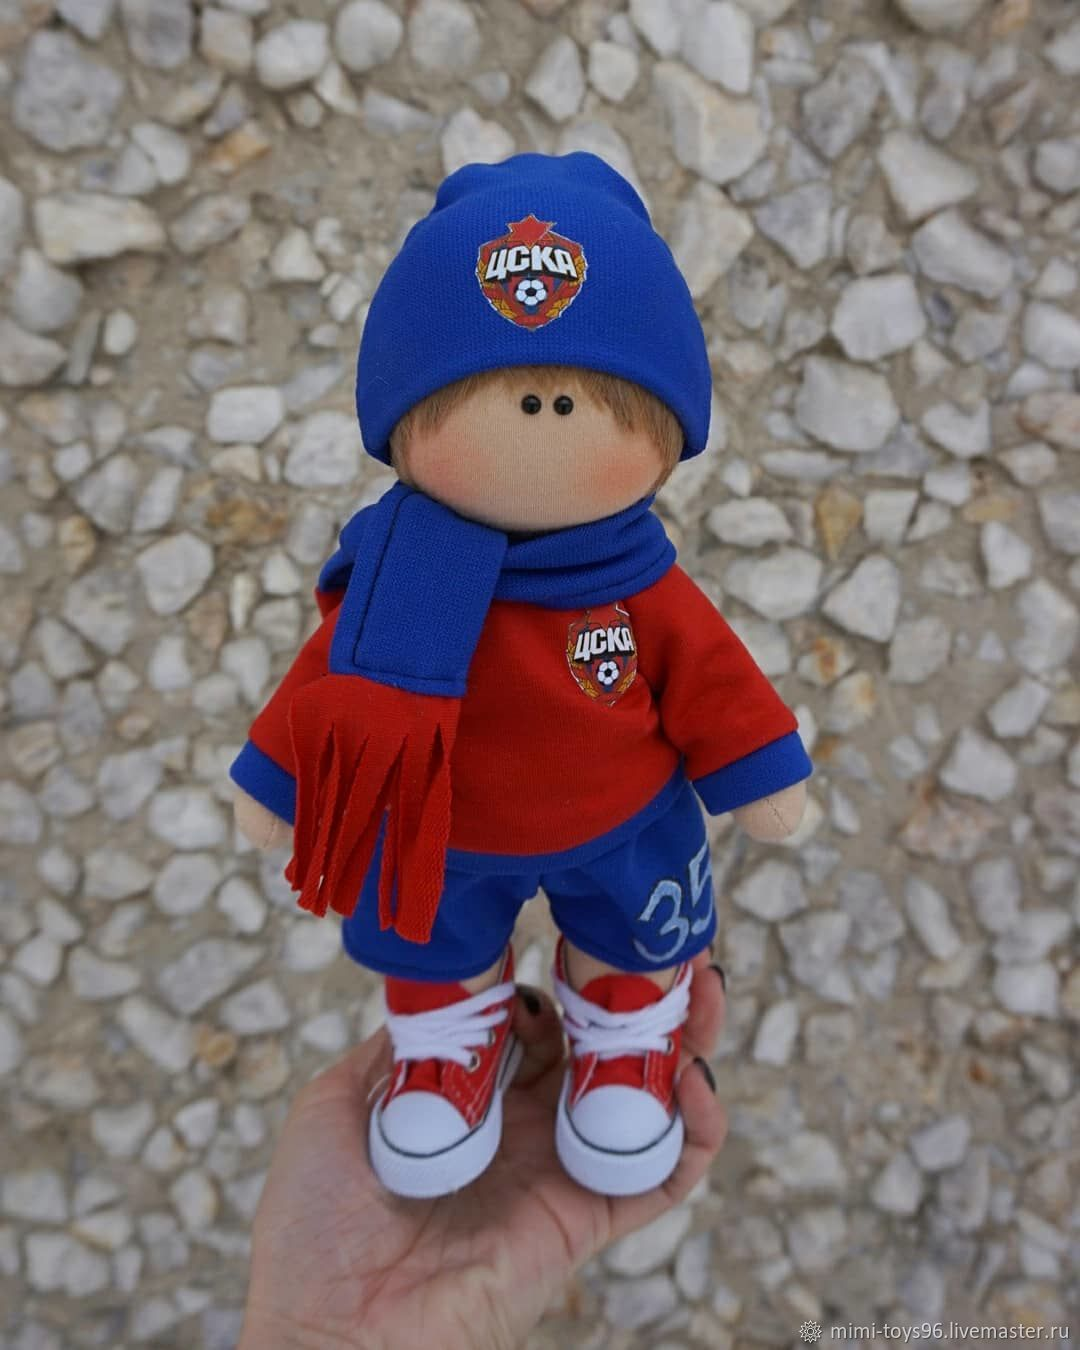 Кукла футболист, Куклы и пупсы, Верхняя Пышма,  Фото №1